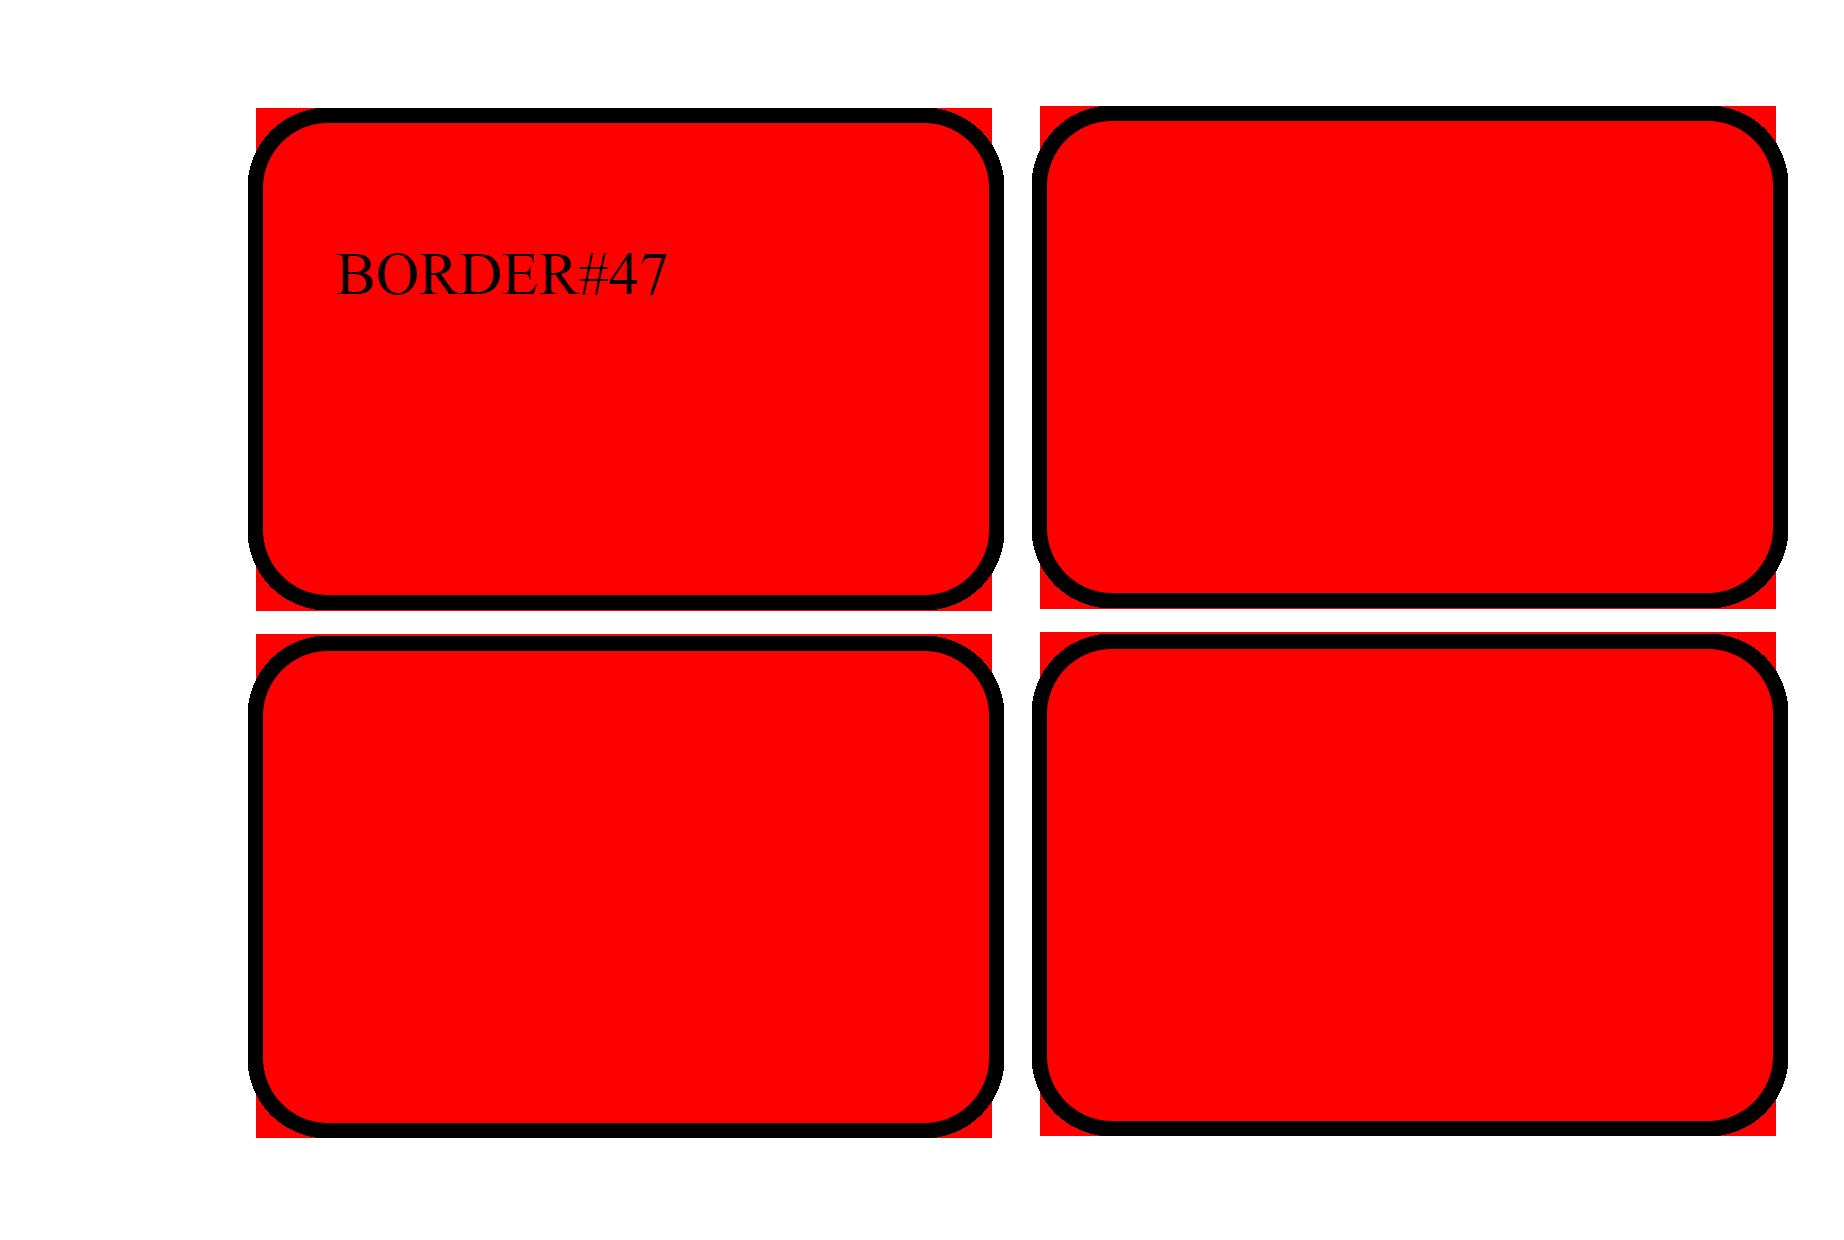 BORDER#47